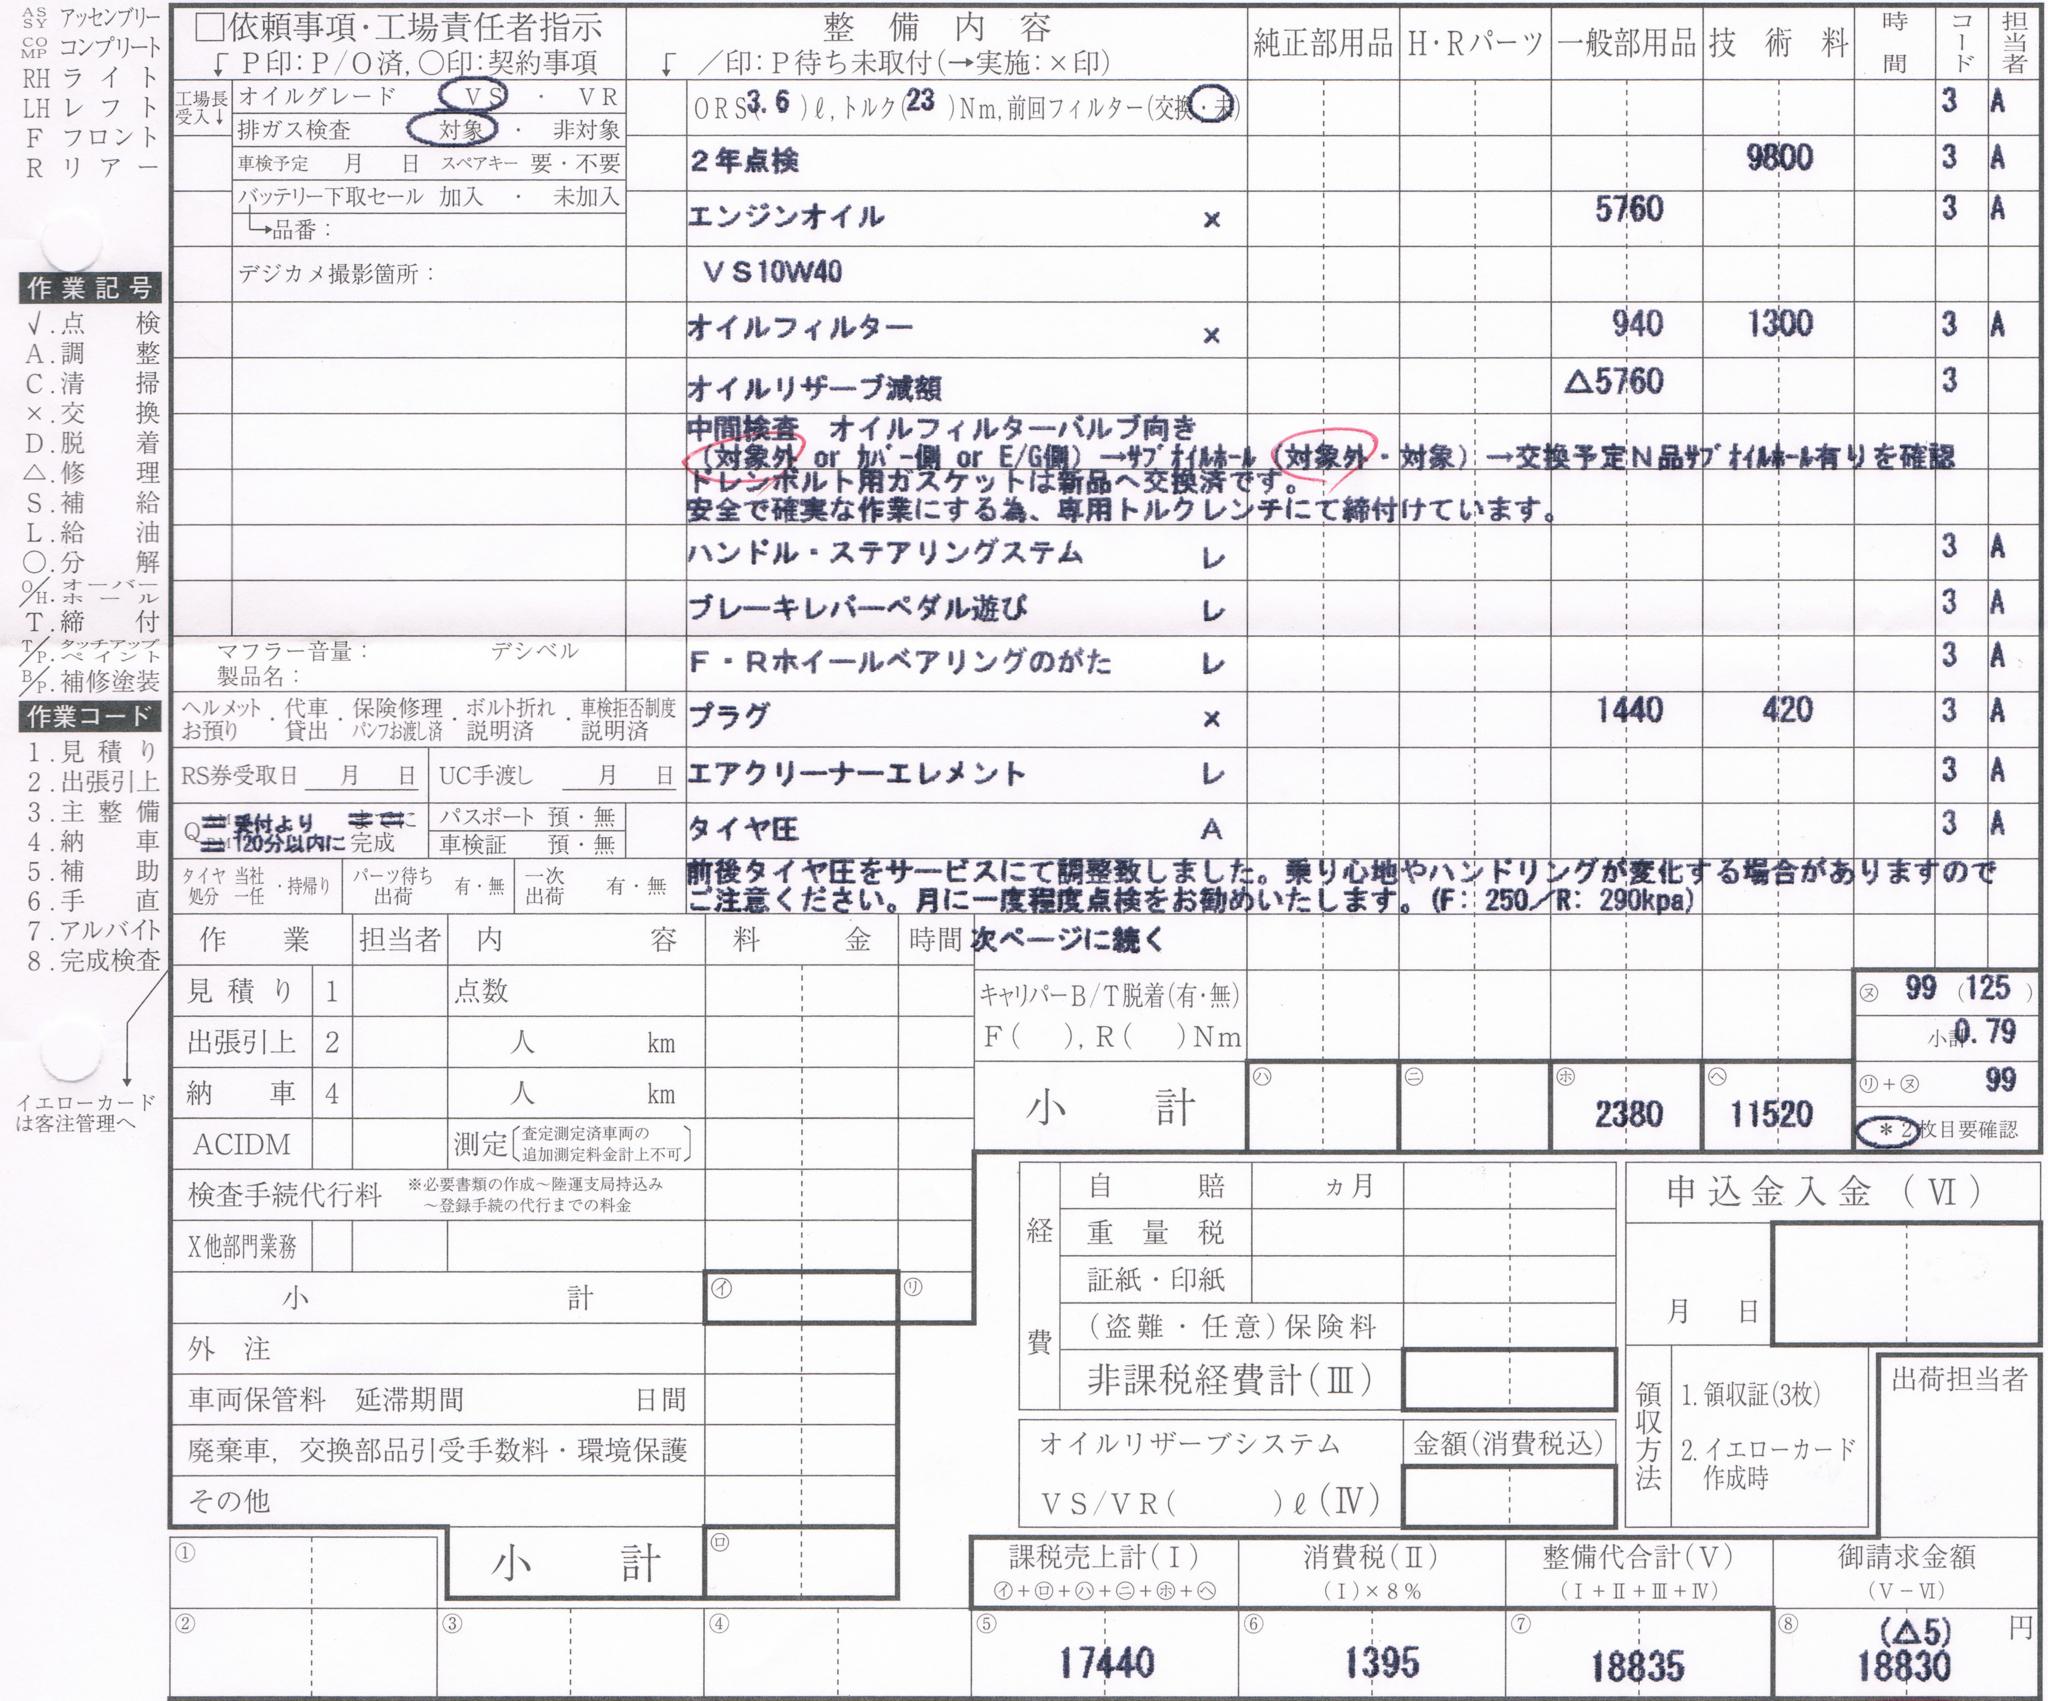 f:id:ToshUeno:20150816180308j:plain